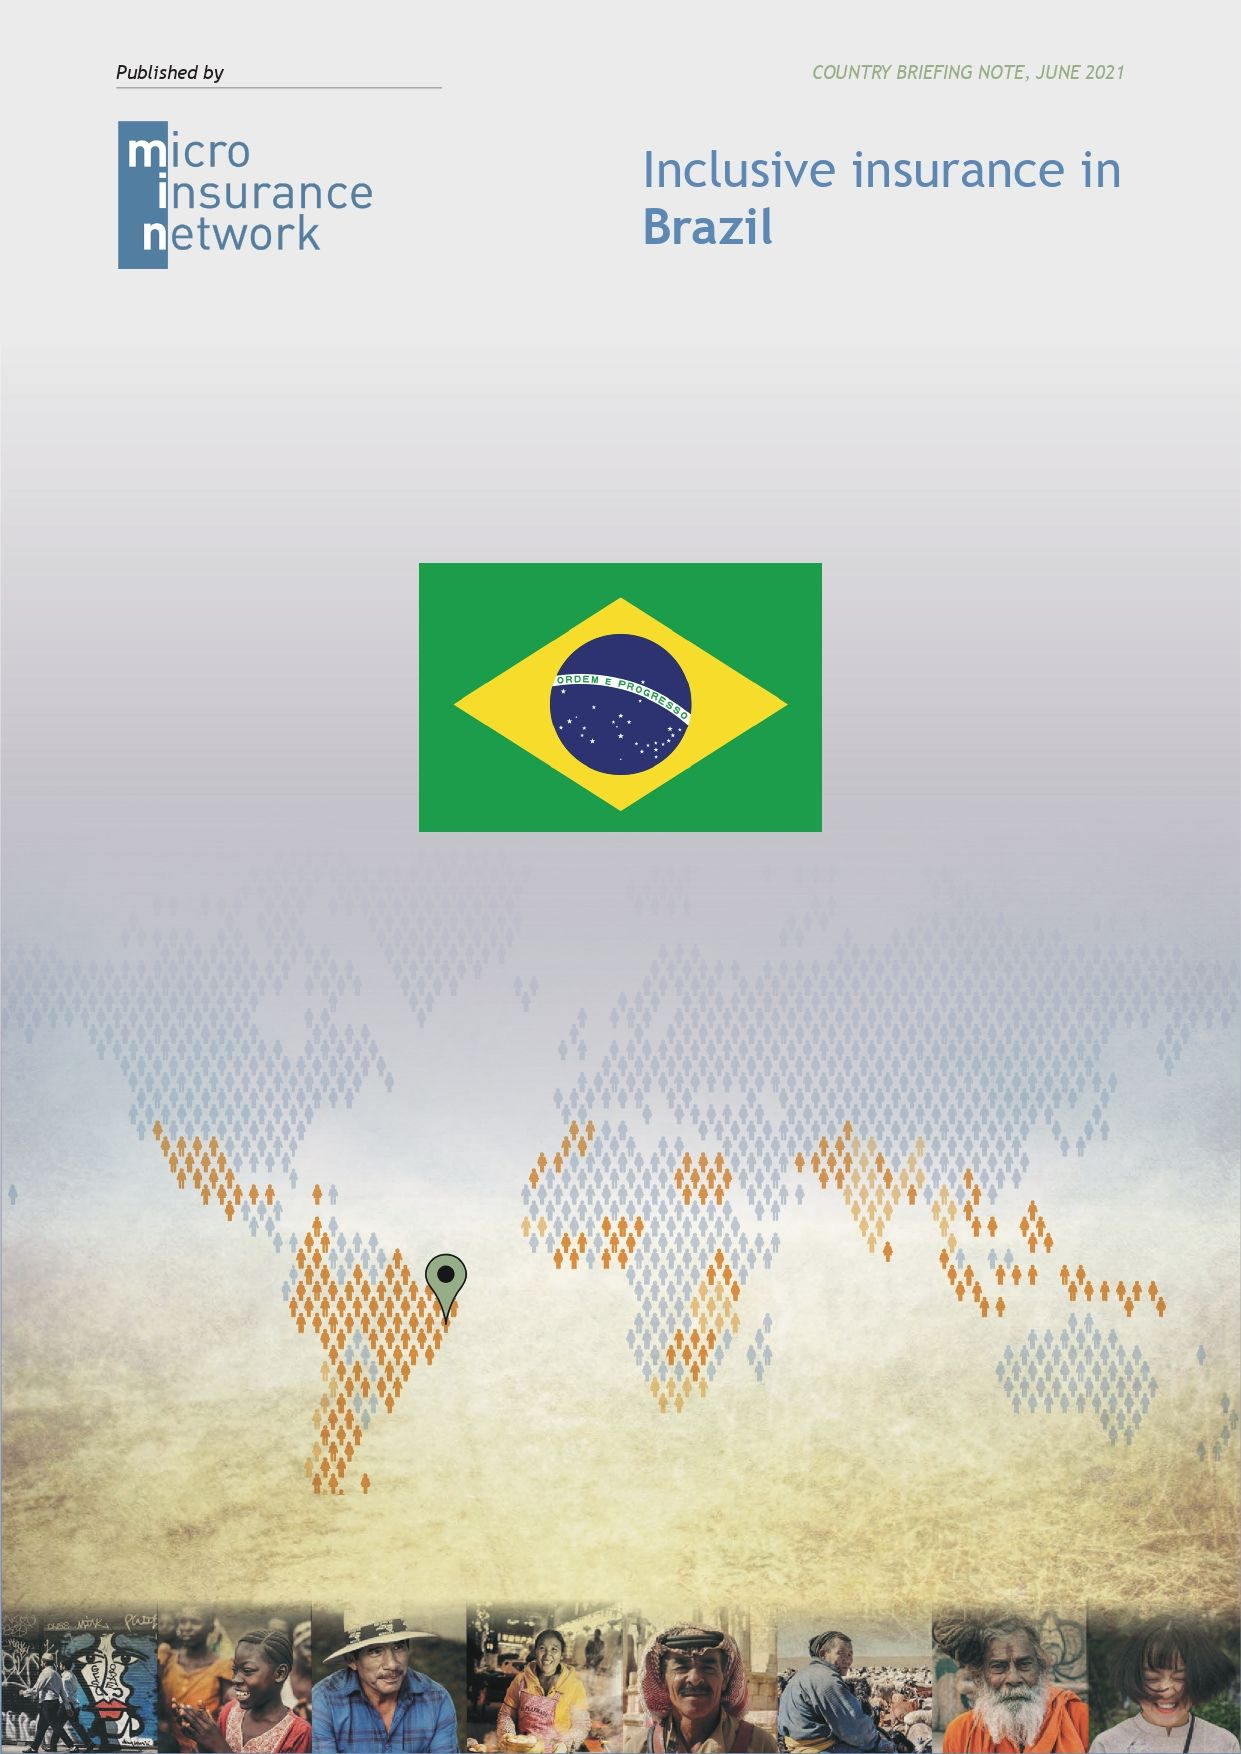 Brazil_EN_vf_ea6e6666b0-1 (2)_page-0001.jpg